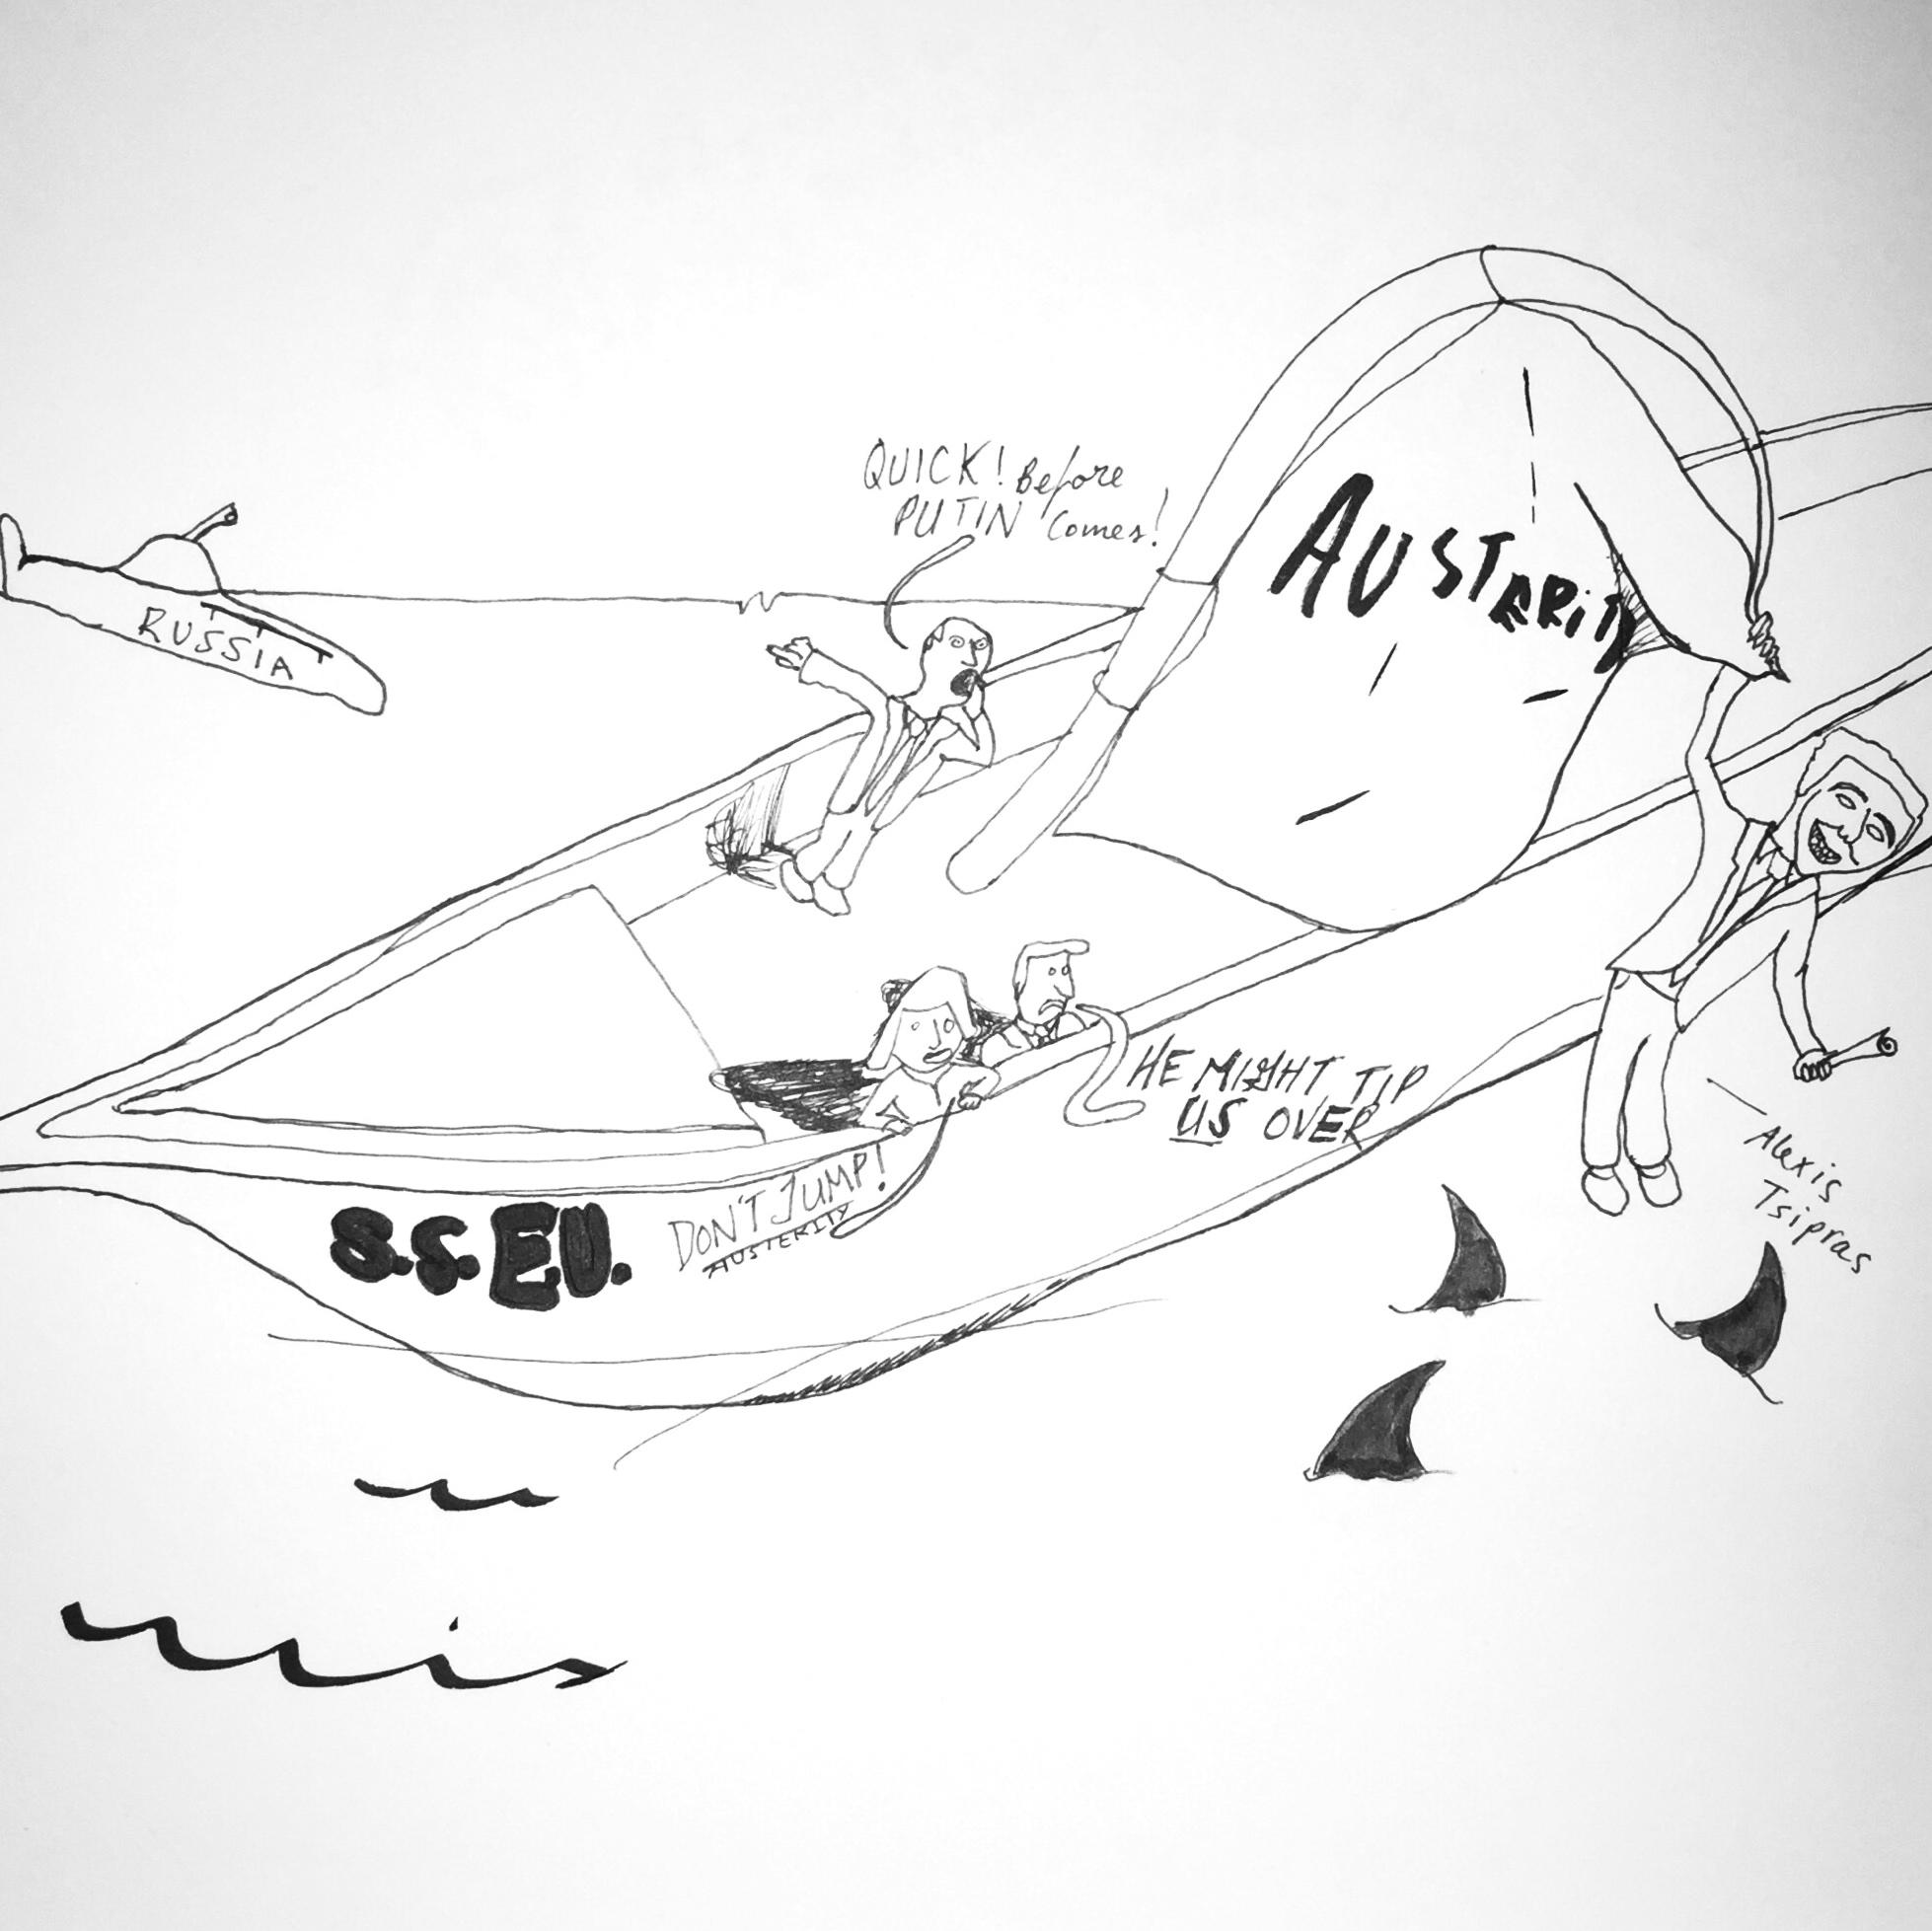 Cartoon by Luis Blanco